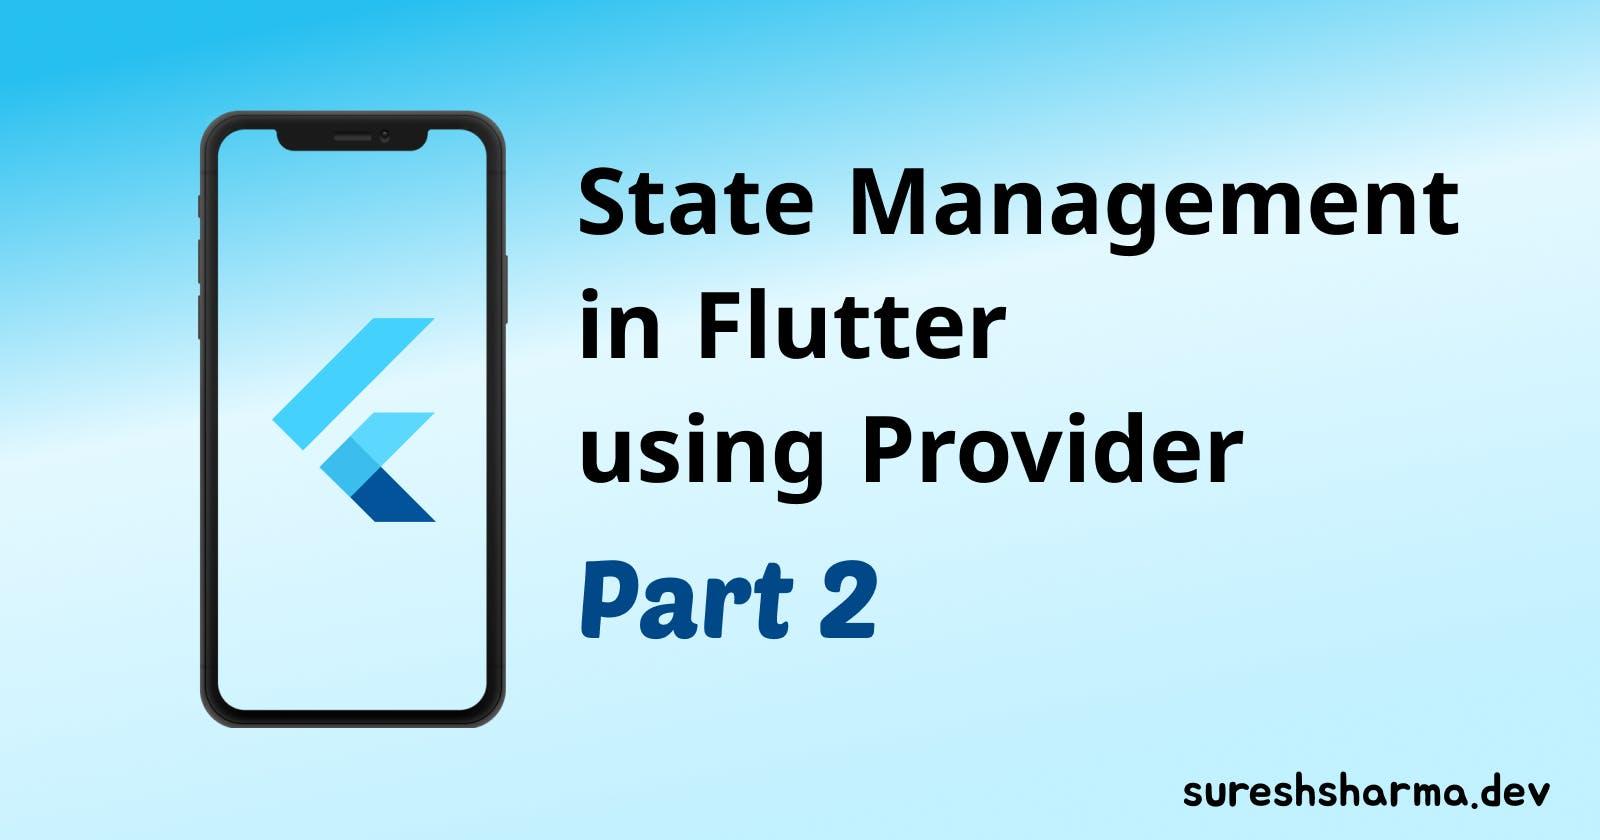 State Management in Flutter using Provider: Part 2